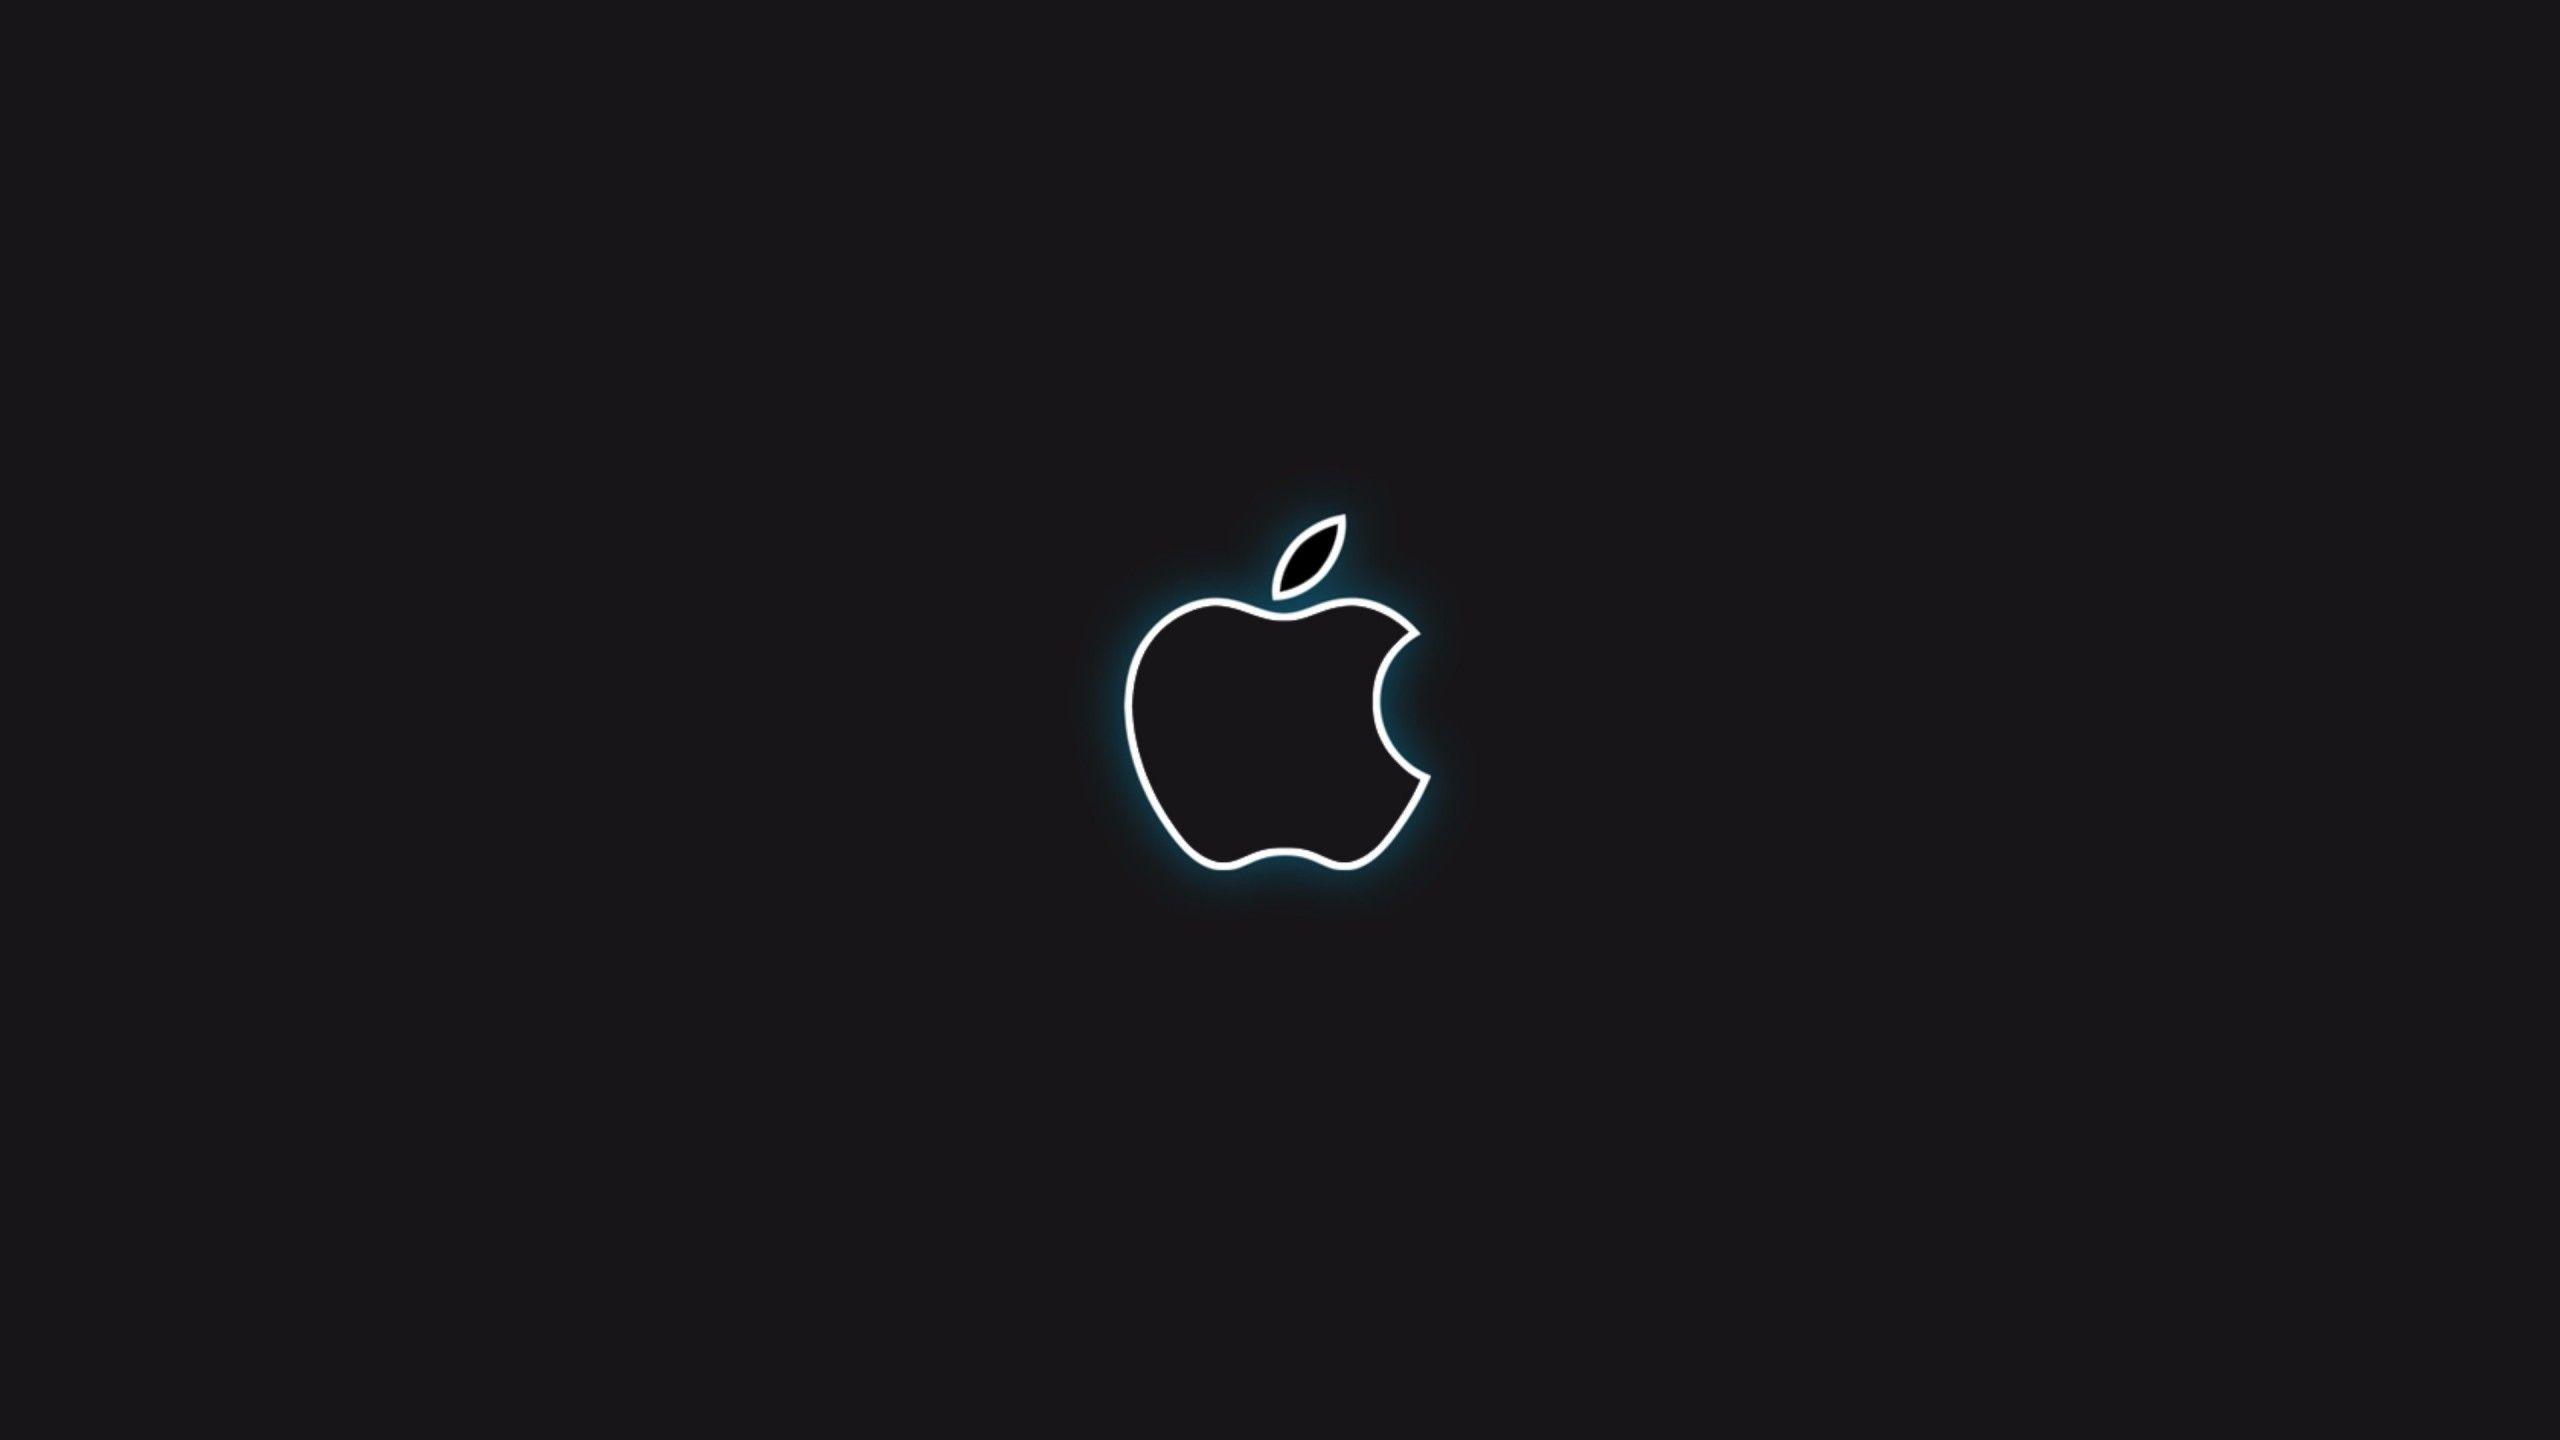 Apple 4k Uhd Wallpapers